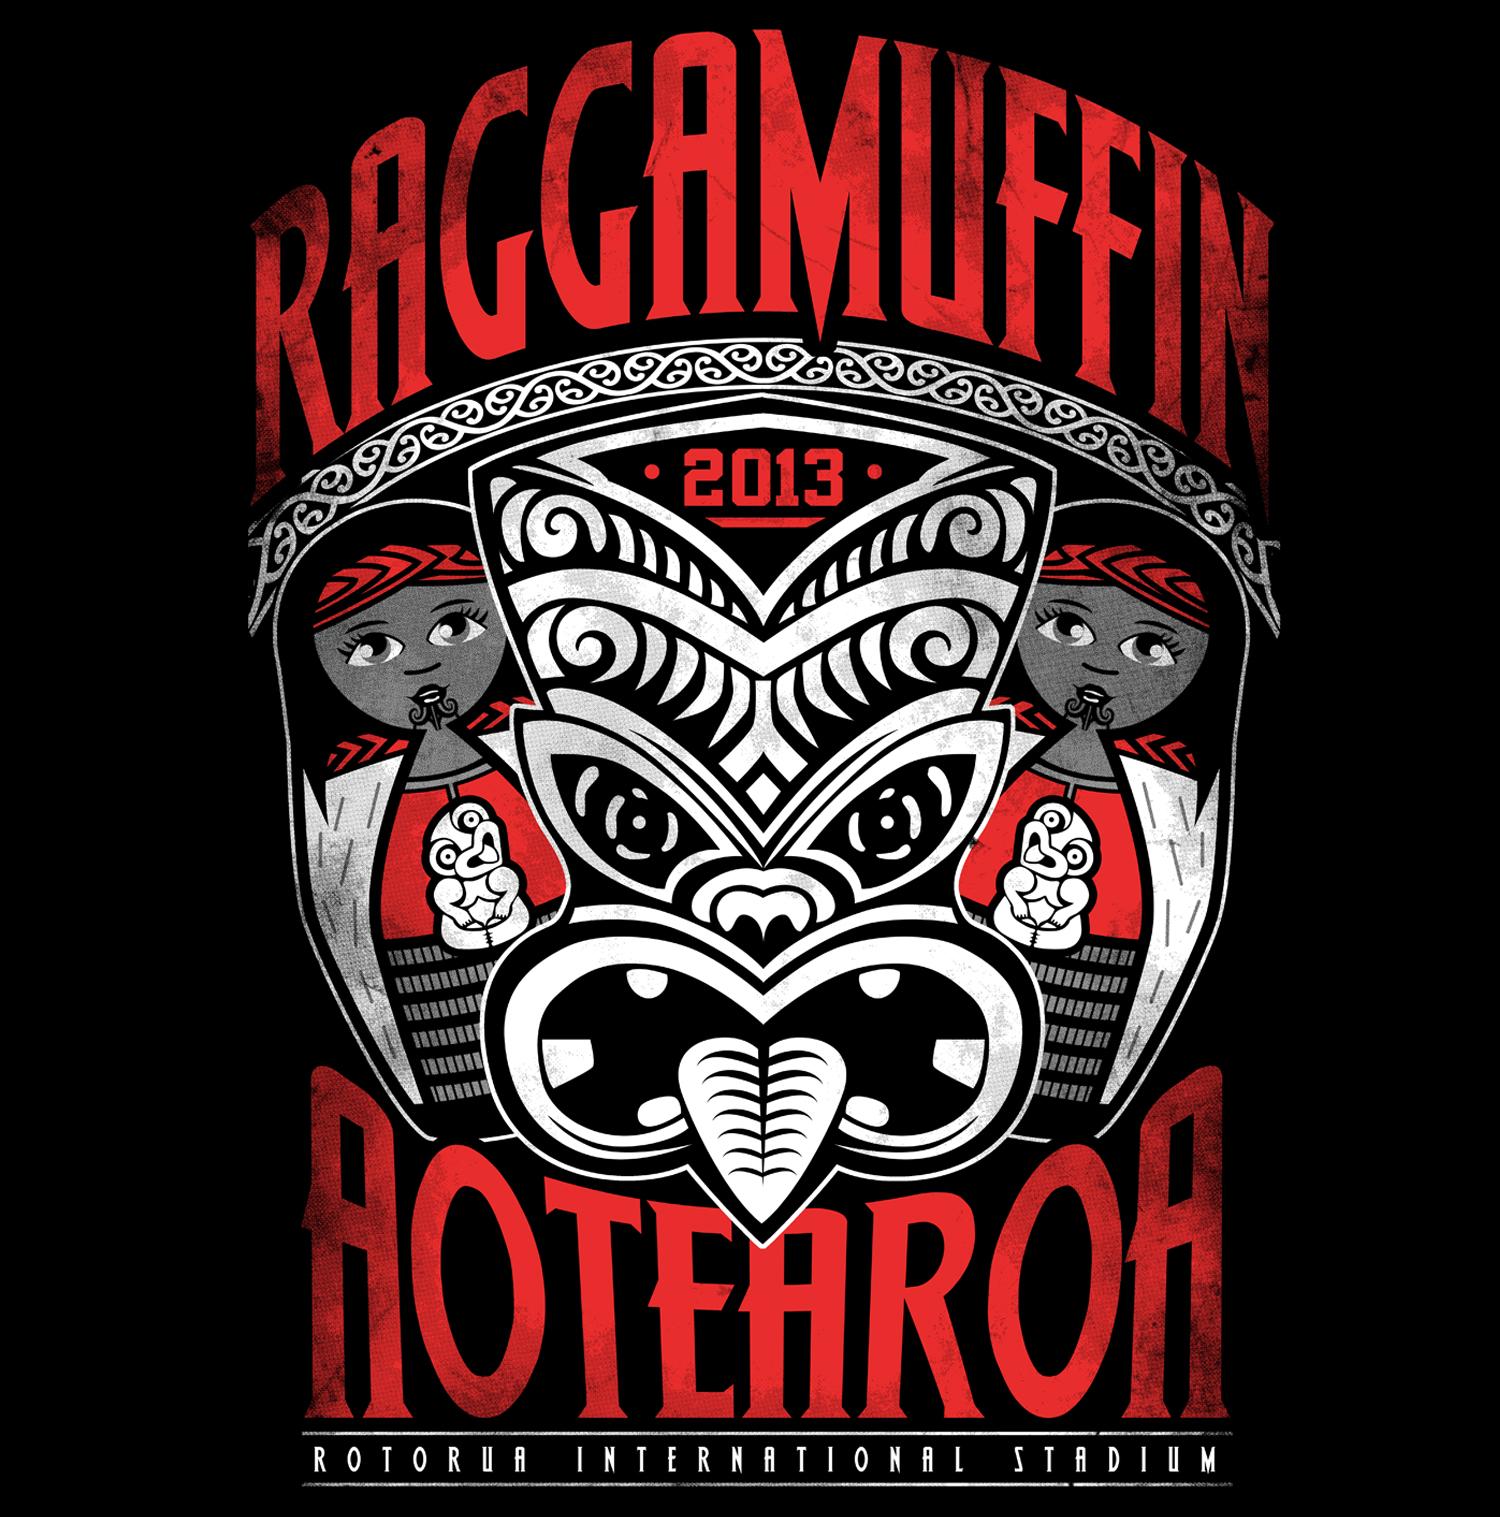 raggamuffin music festival tee.jpg